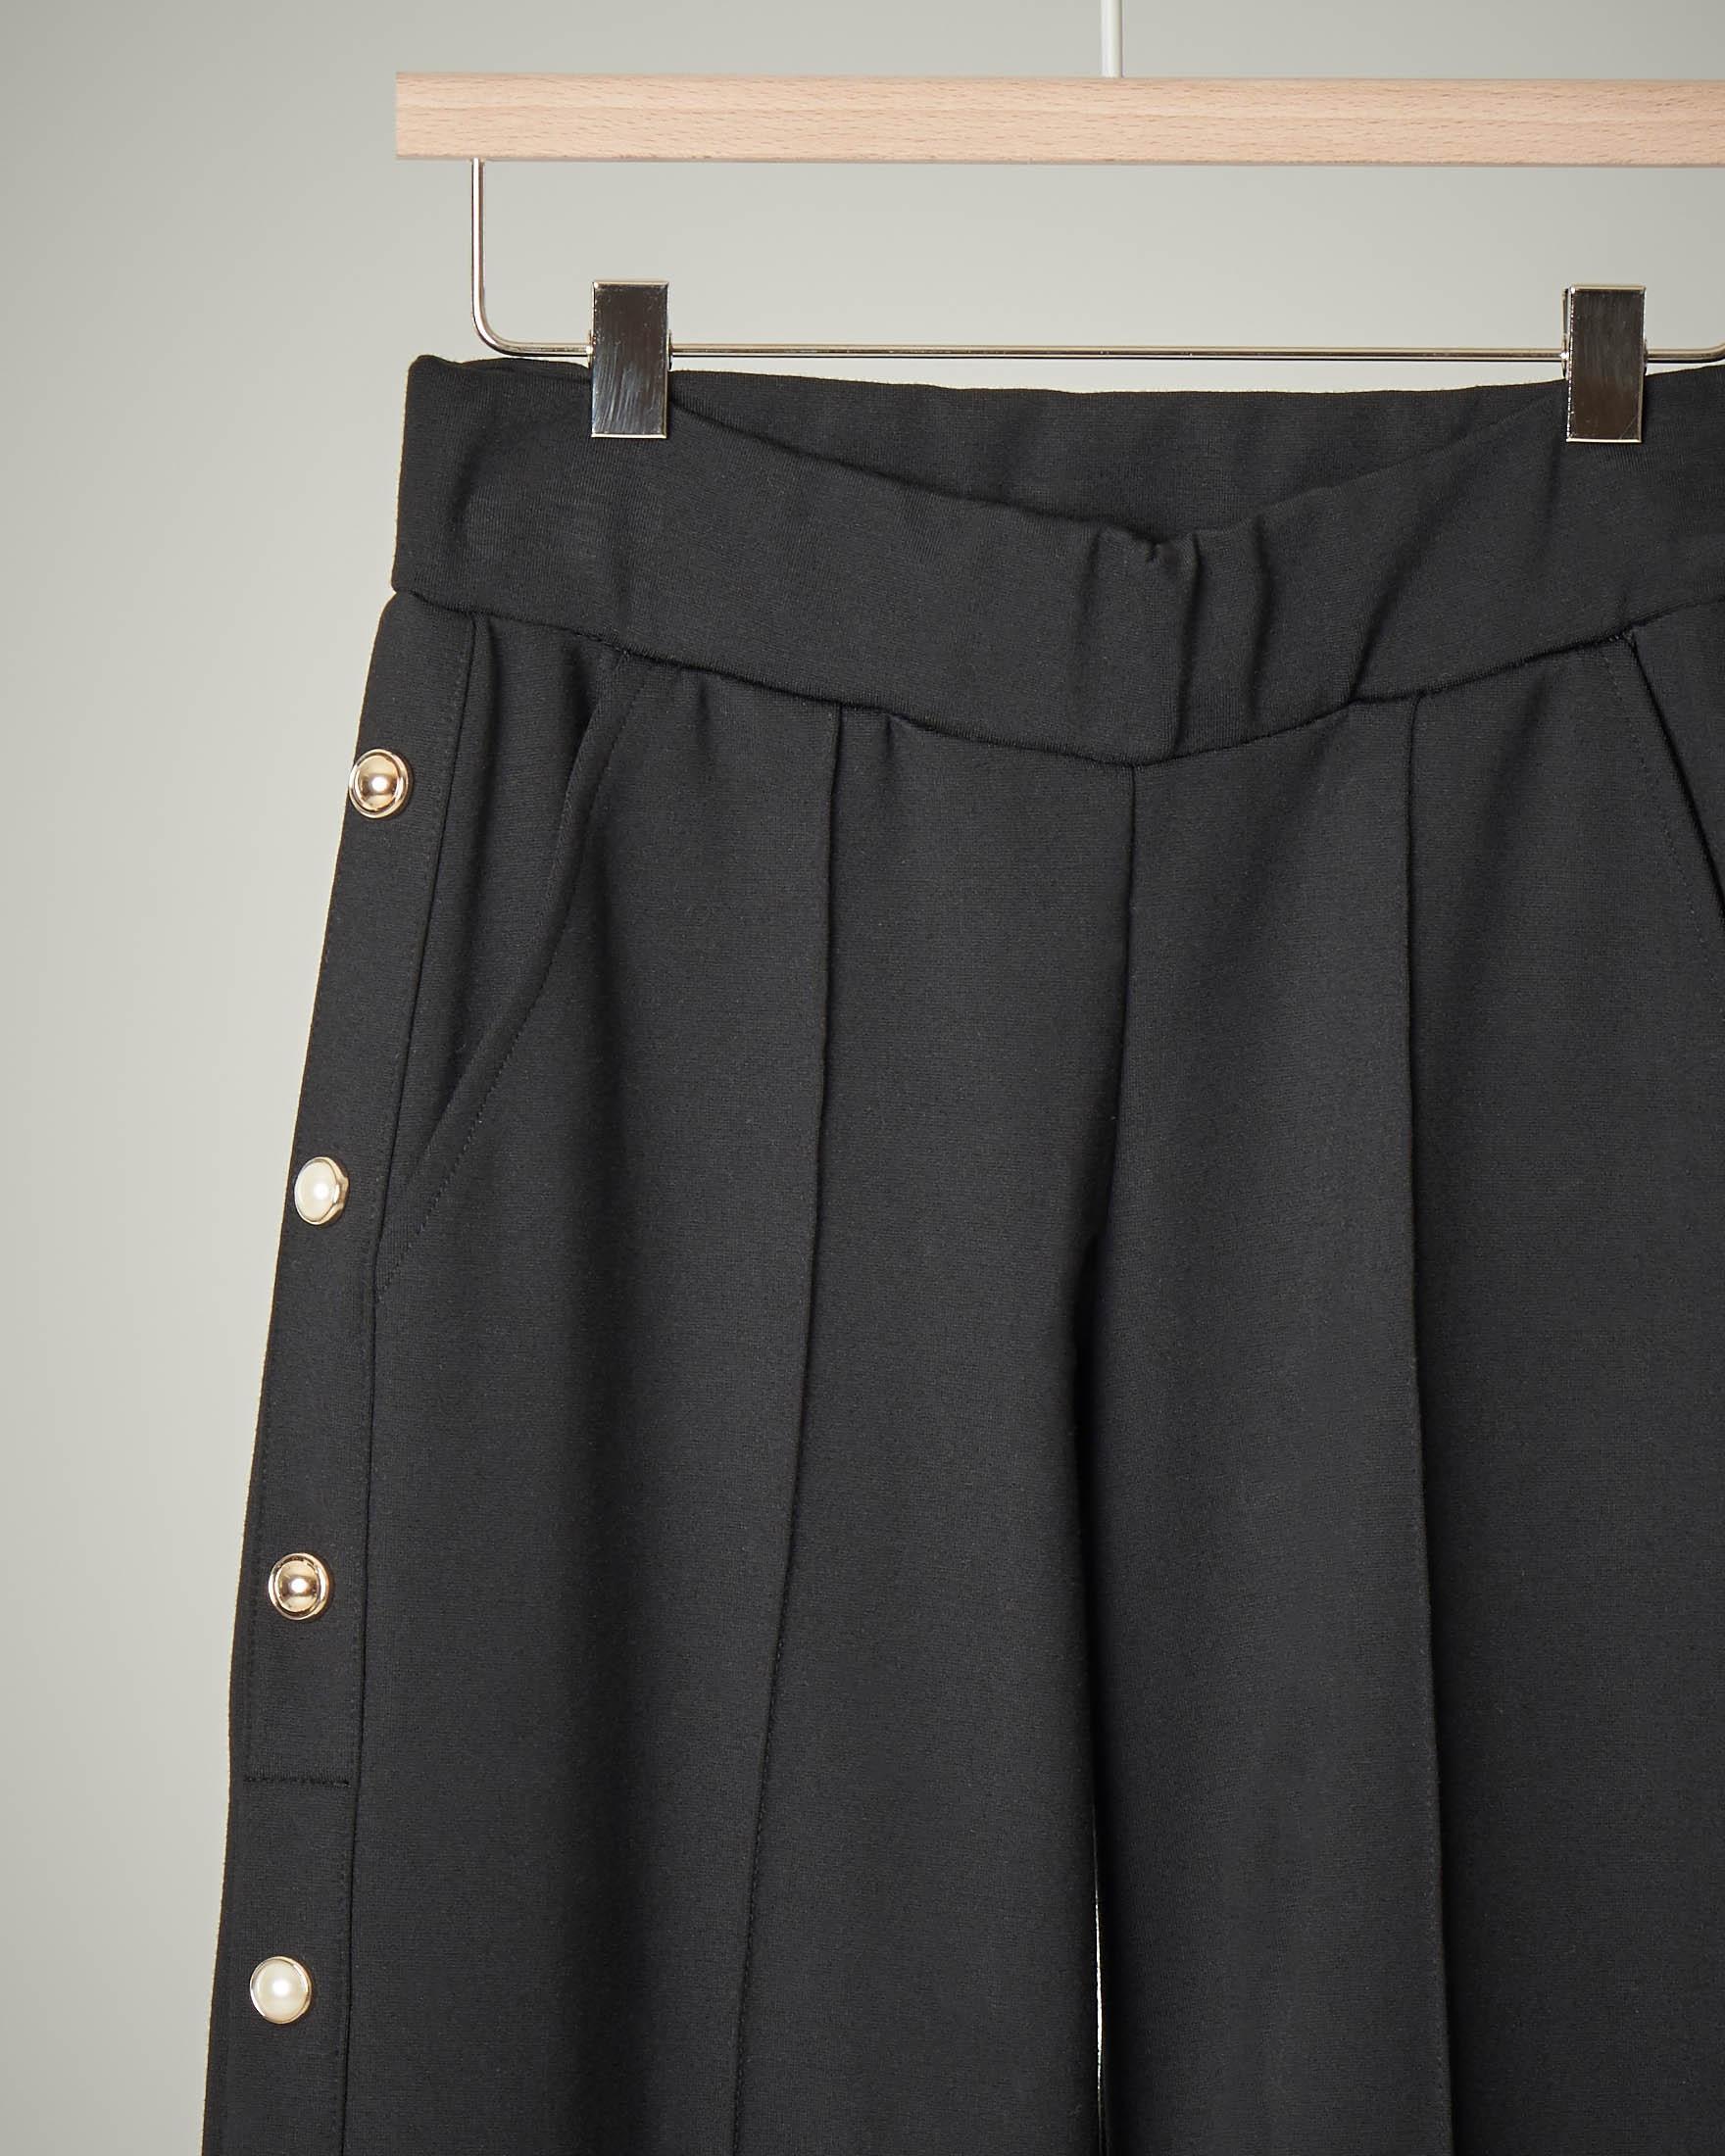 Pantalone nero palazzo con bottoni sui fianchi 44-46